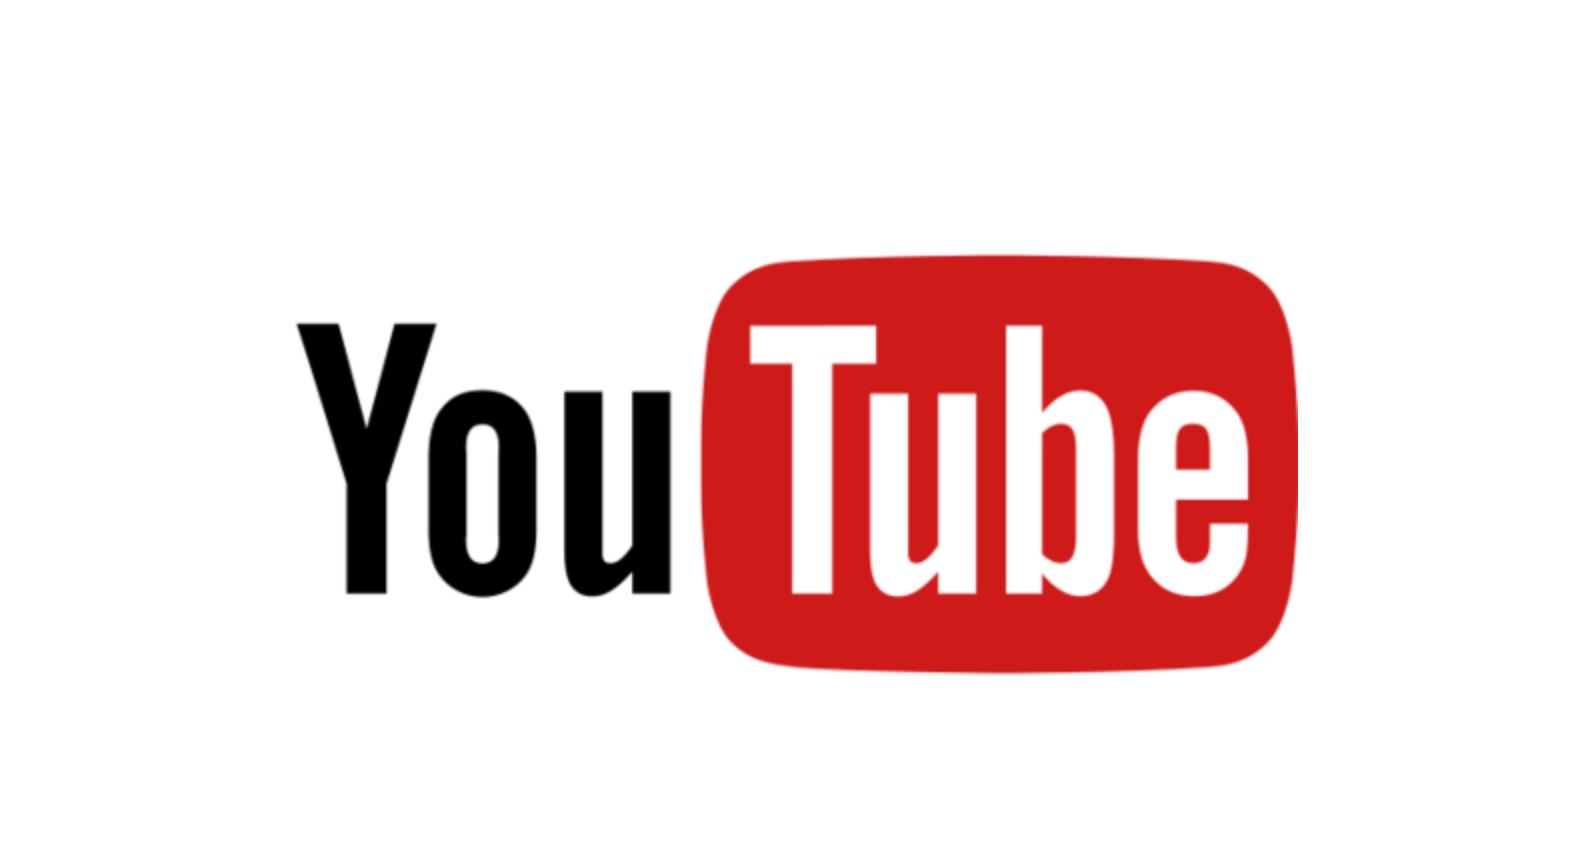 Youtube logo 2015–2017